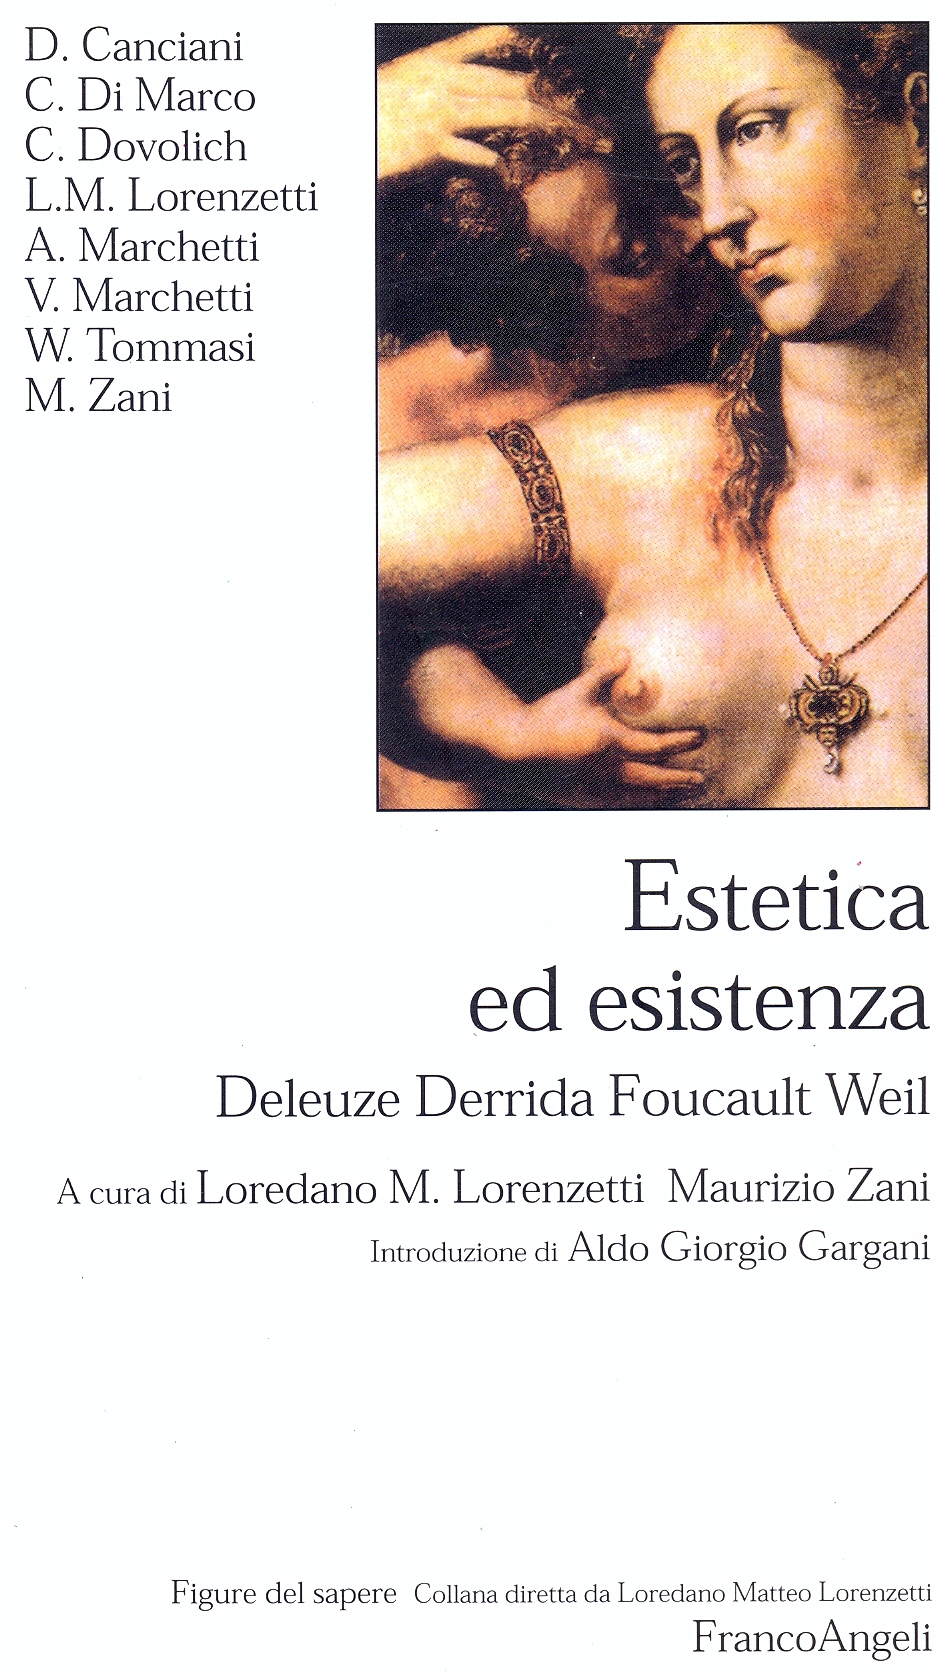 Estetica ed esistenza